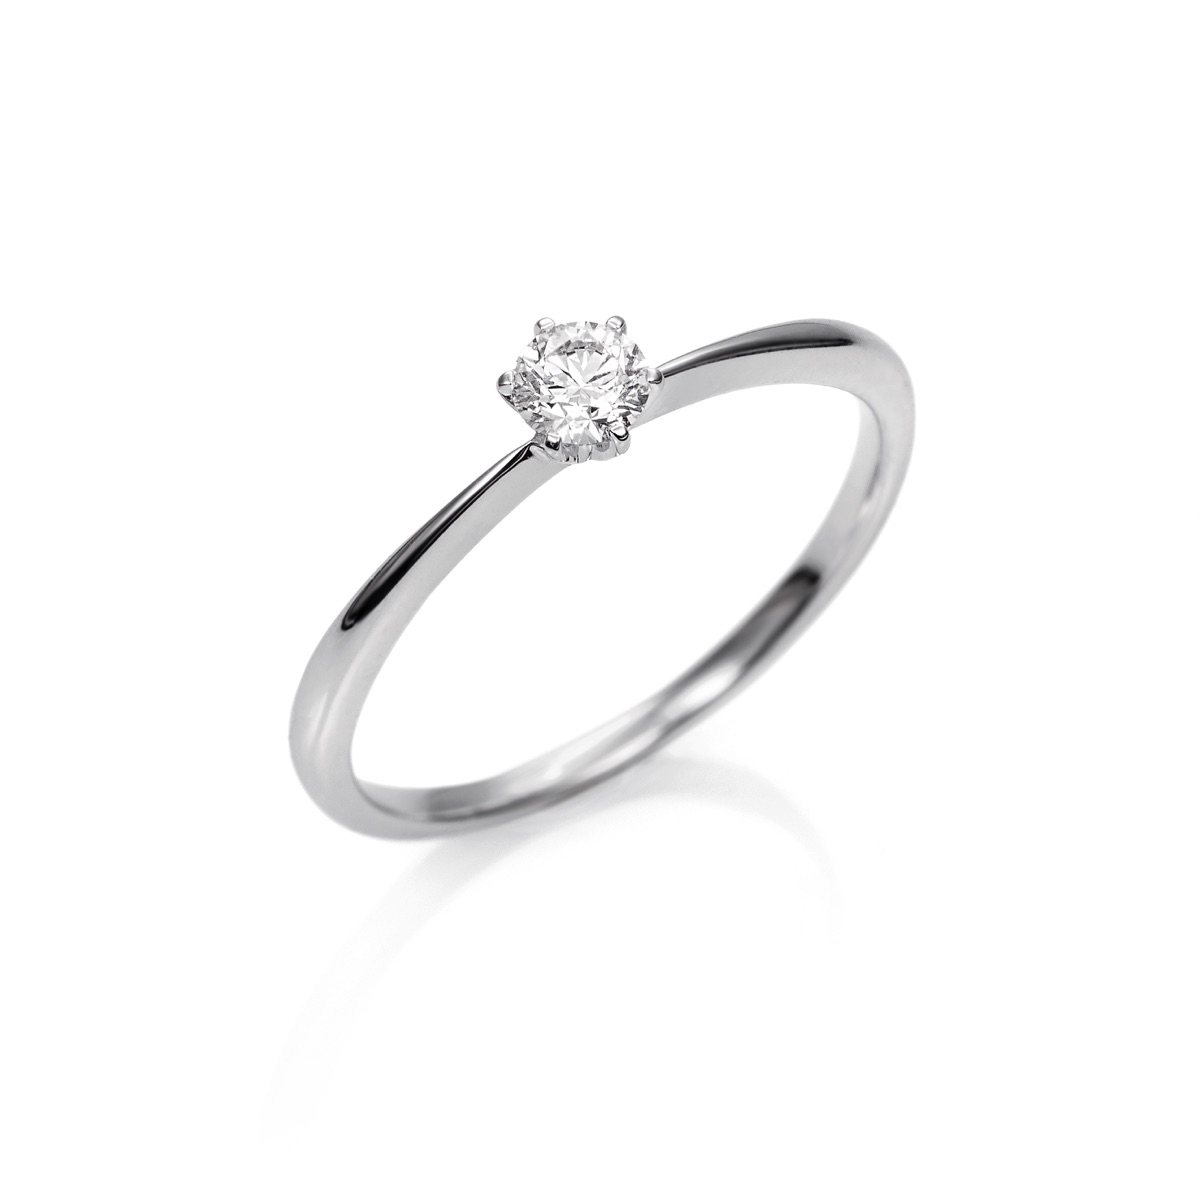 1213c03354f1 Anillo Solitario de Oro blanco 18kts con Diamante ...